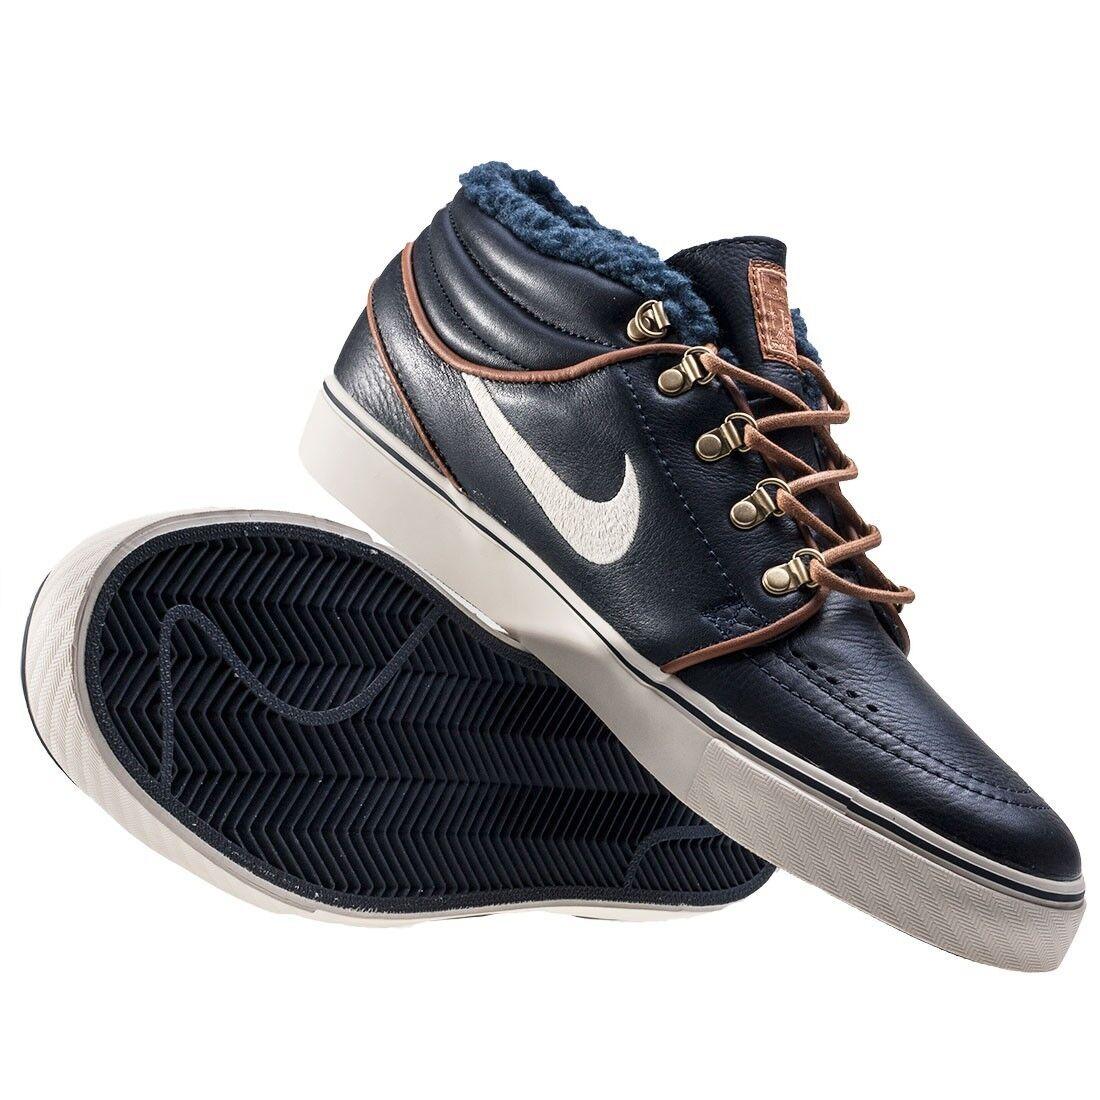 Nike SB Zoom Stefan Janoski Mid Premium 472679-423 Size 7 UK